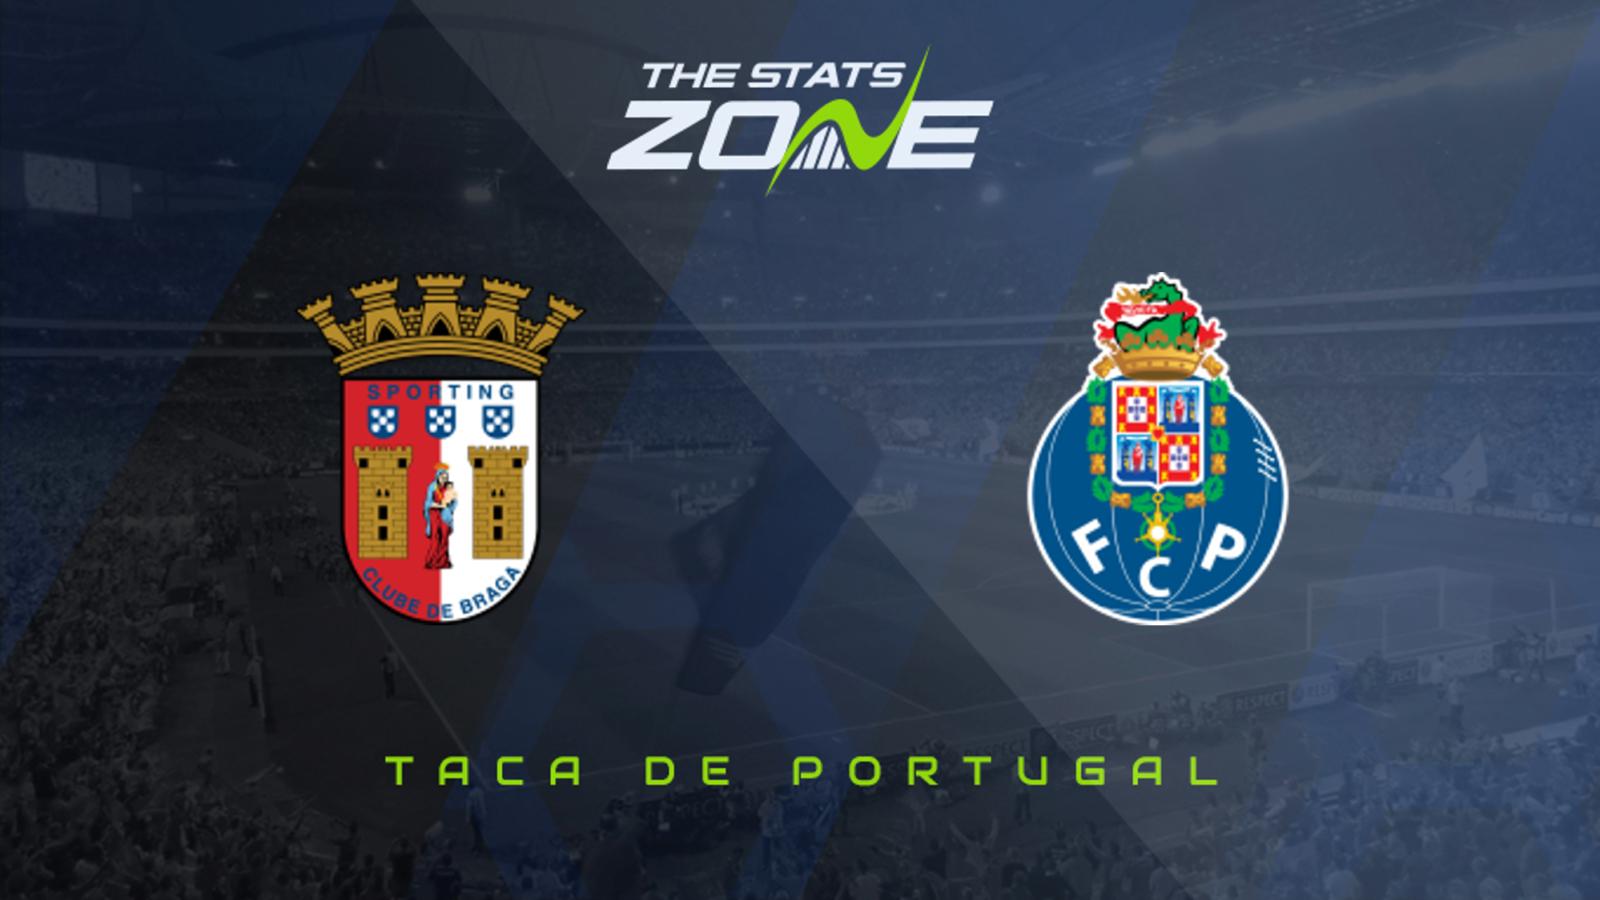 Porto v estoril betting preview live betting explained synonym